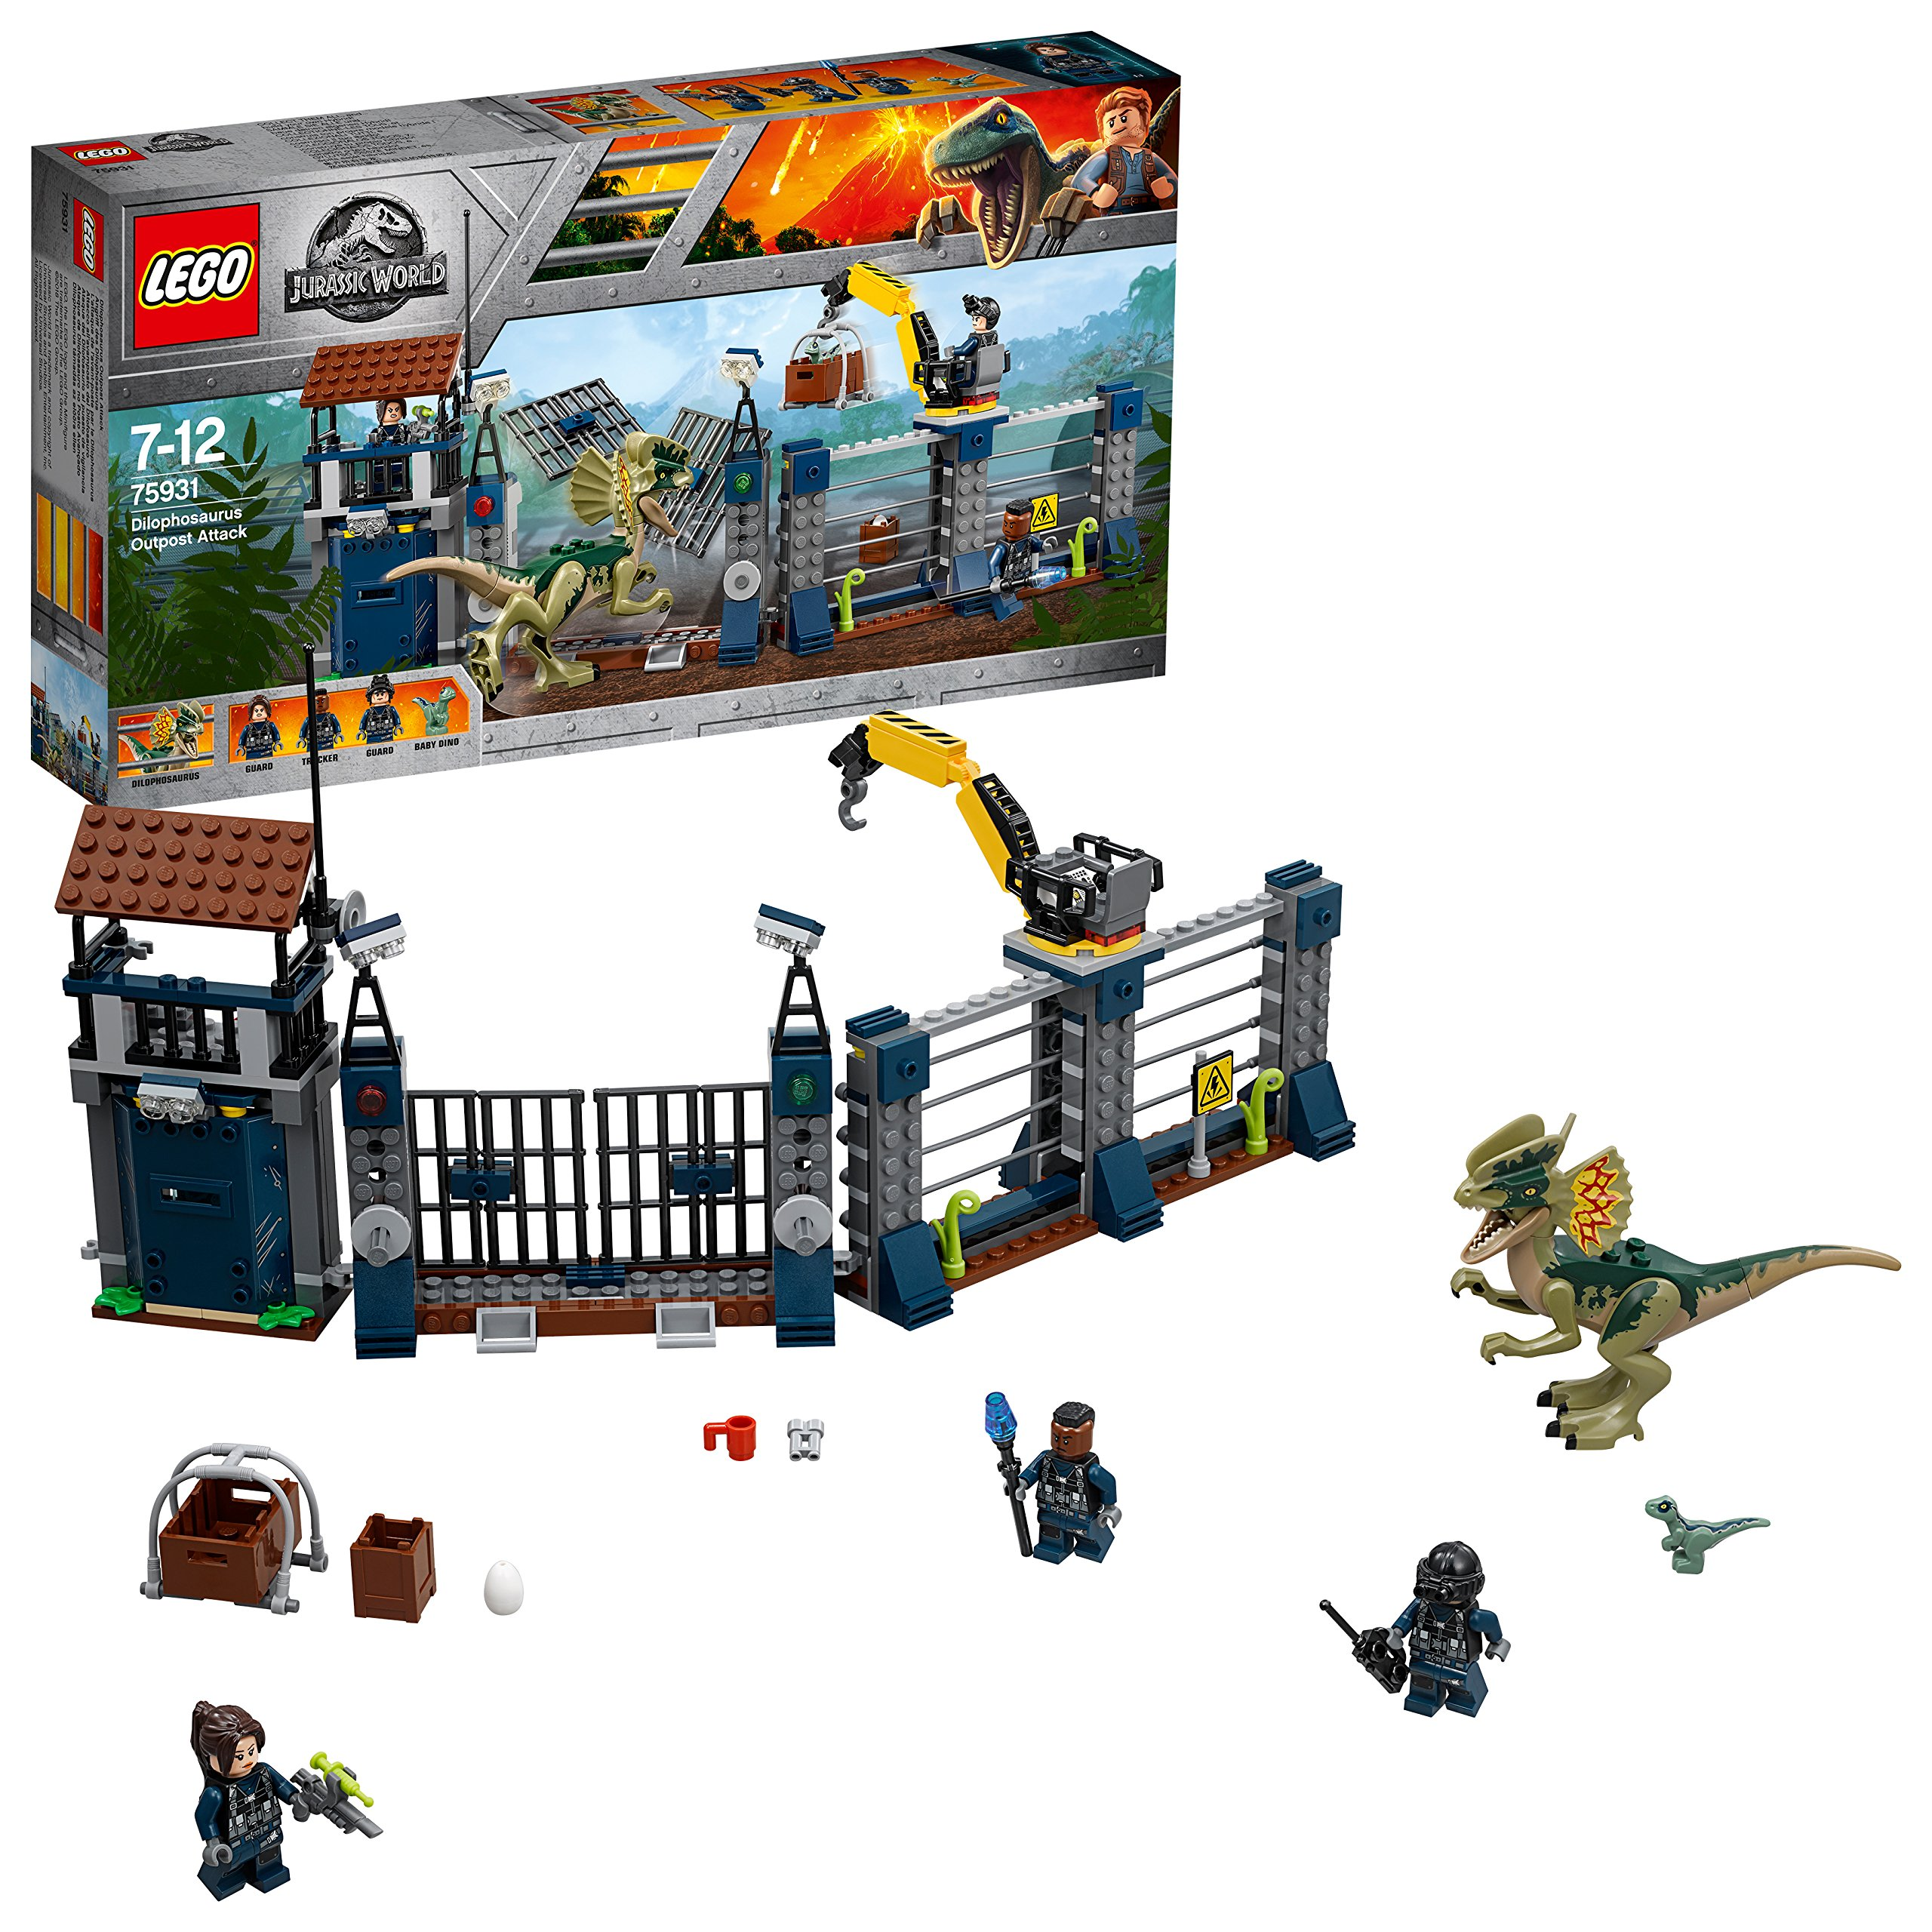 LEGO 75931 Jurassic World Dilophosaurus Outpost Attack Playset, Dinosaur Figures, Build & Play Dinosaur Toys for Kids by LEGO (Image #1)